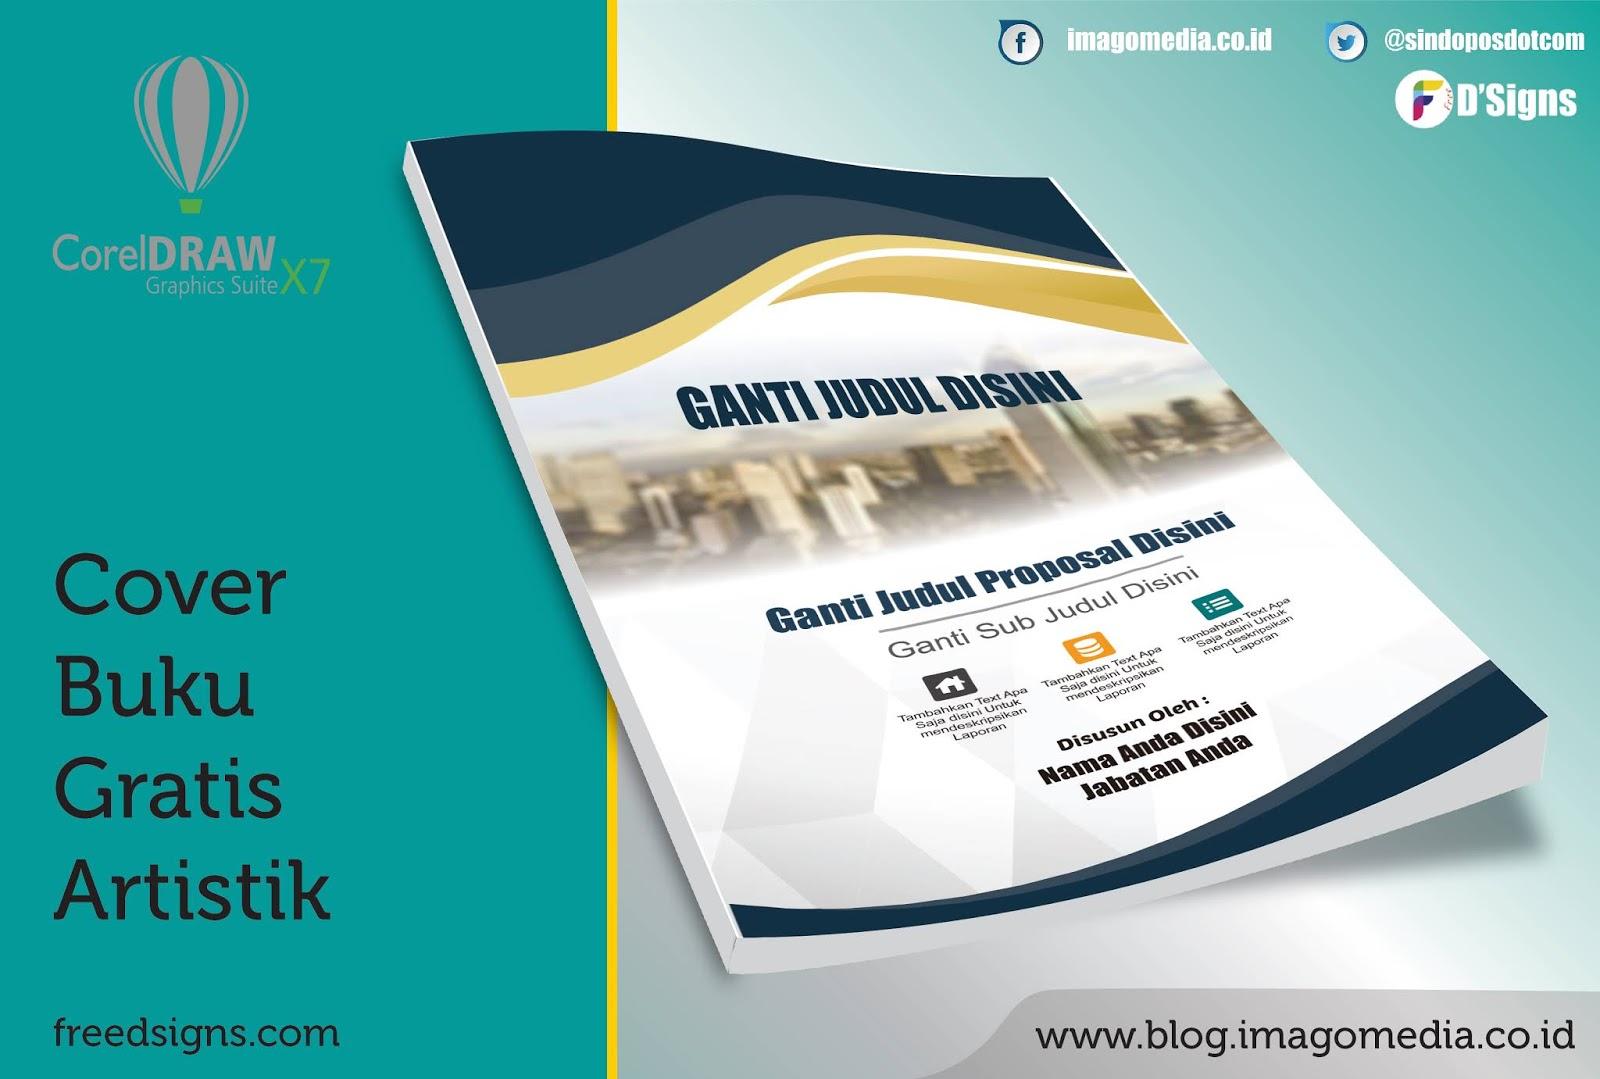 Download_Desain_Cover_Buku_Gratis_Corel_Draw_Artistik